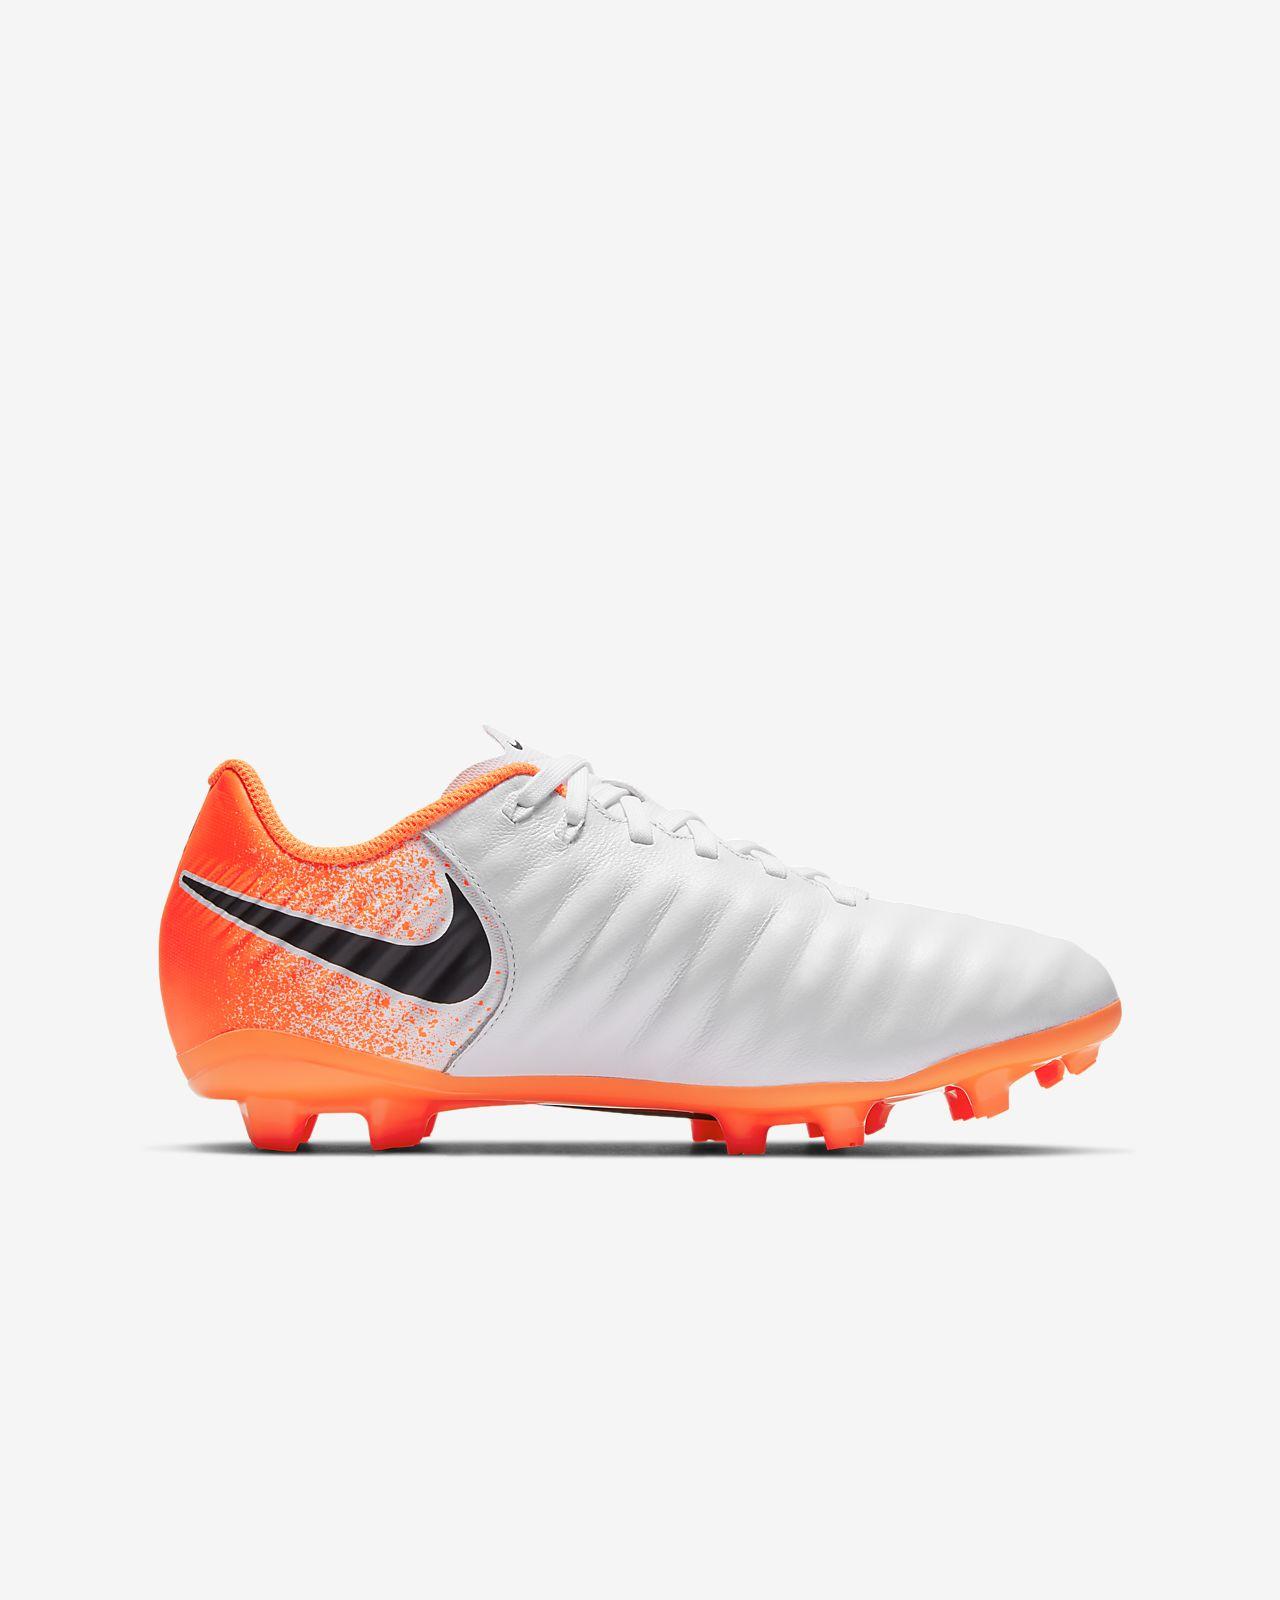 a07887a6230 ... Nike Jr. Legend 7 Academy FG Younger Older Kids  Firm-Ground Football